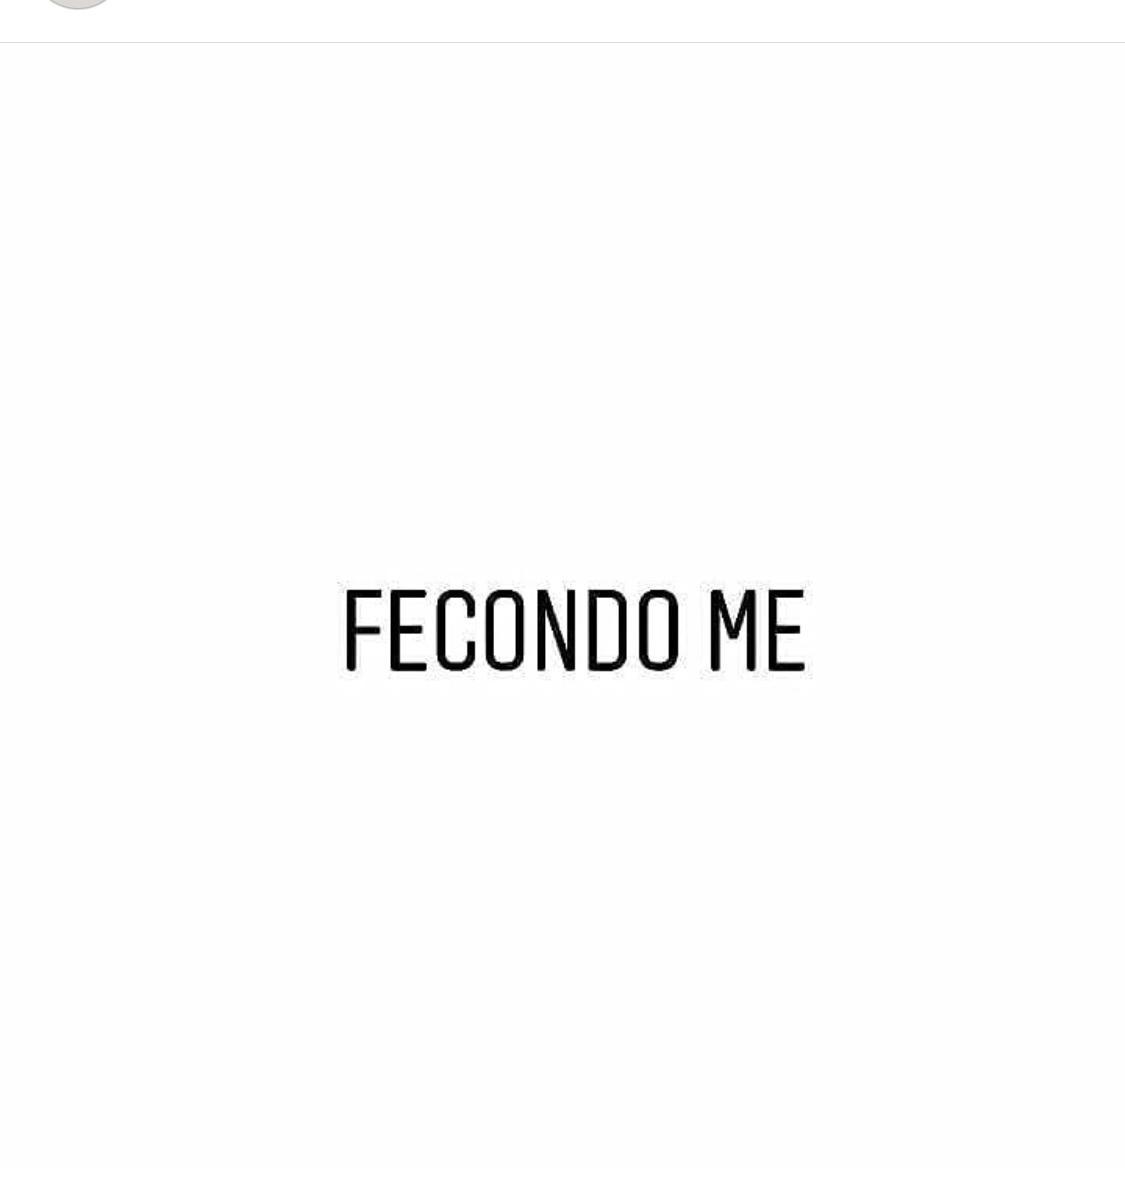 FECONDO ME